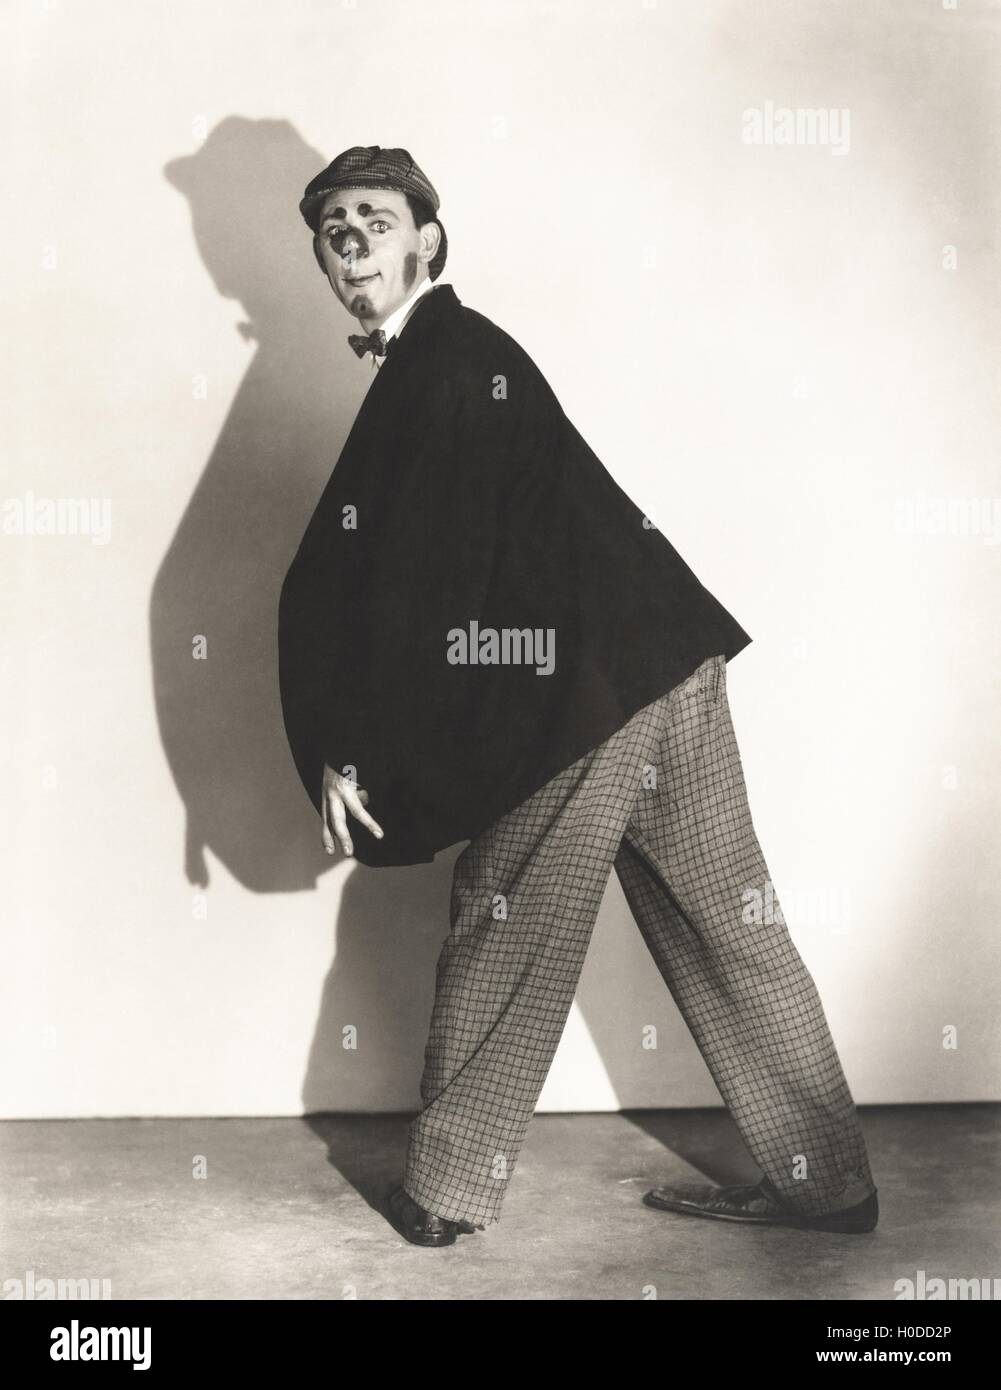 Man wearing rubber clown nose - Stock Image